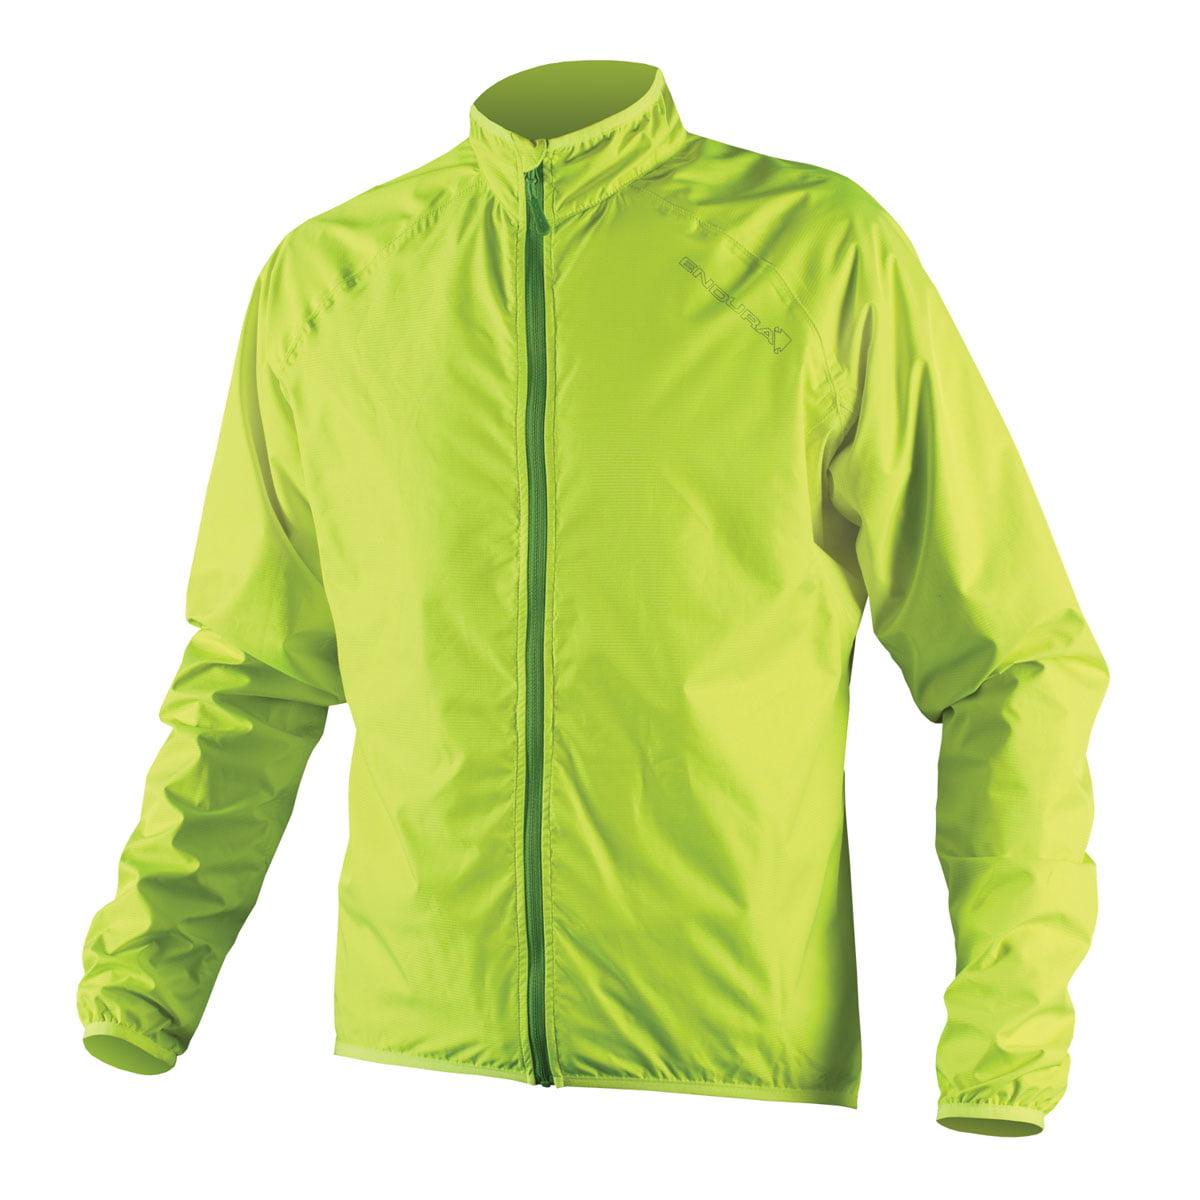 Endura 2016 Men's Xtract Light Weight Packable Waterproof Cycling Jacket E9071 by Endura